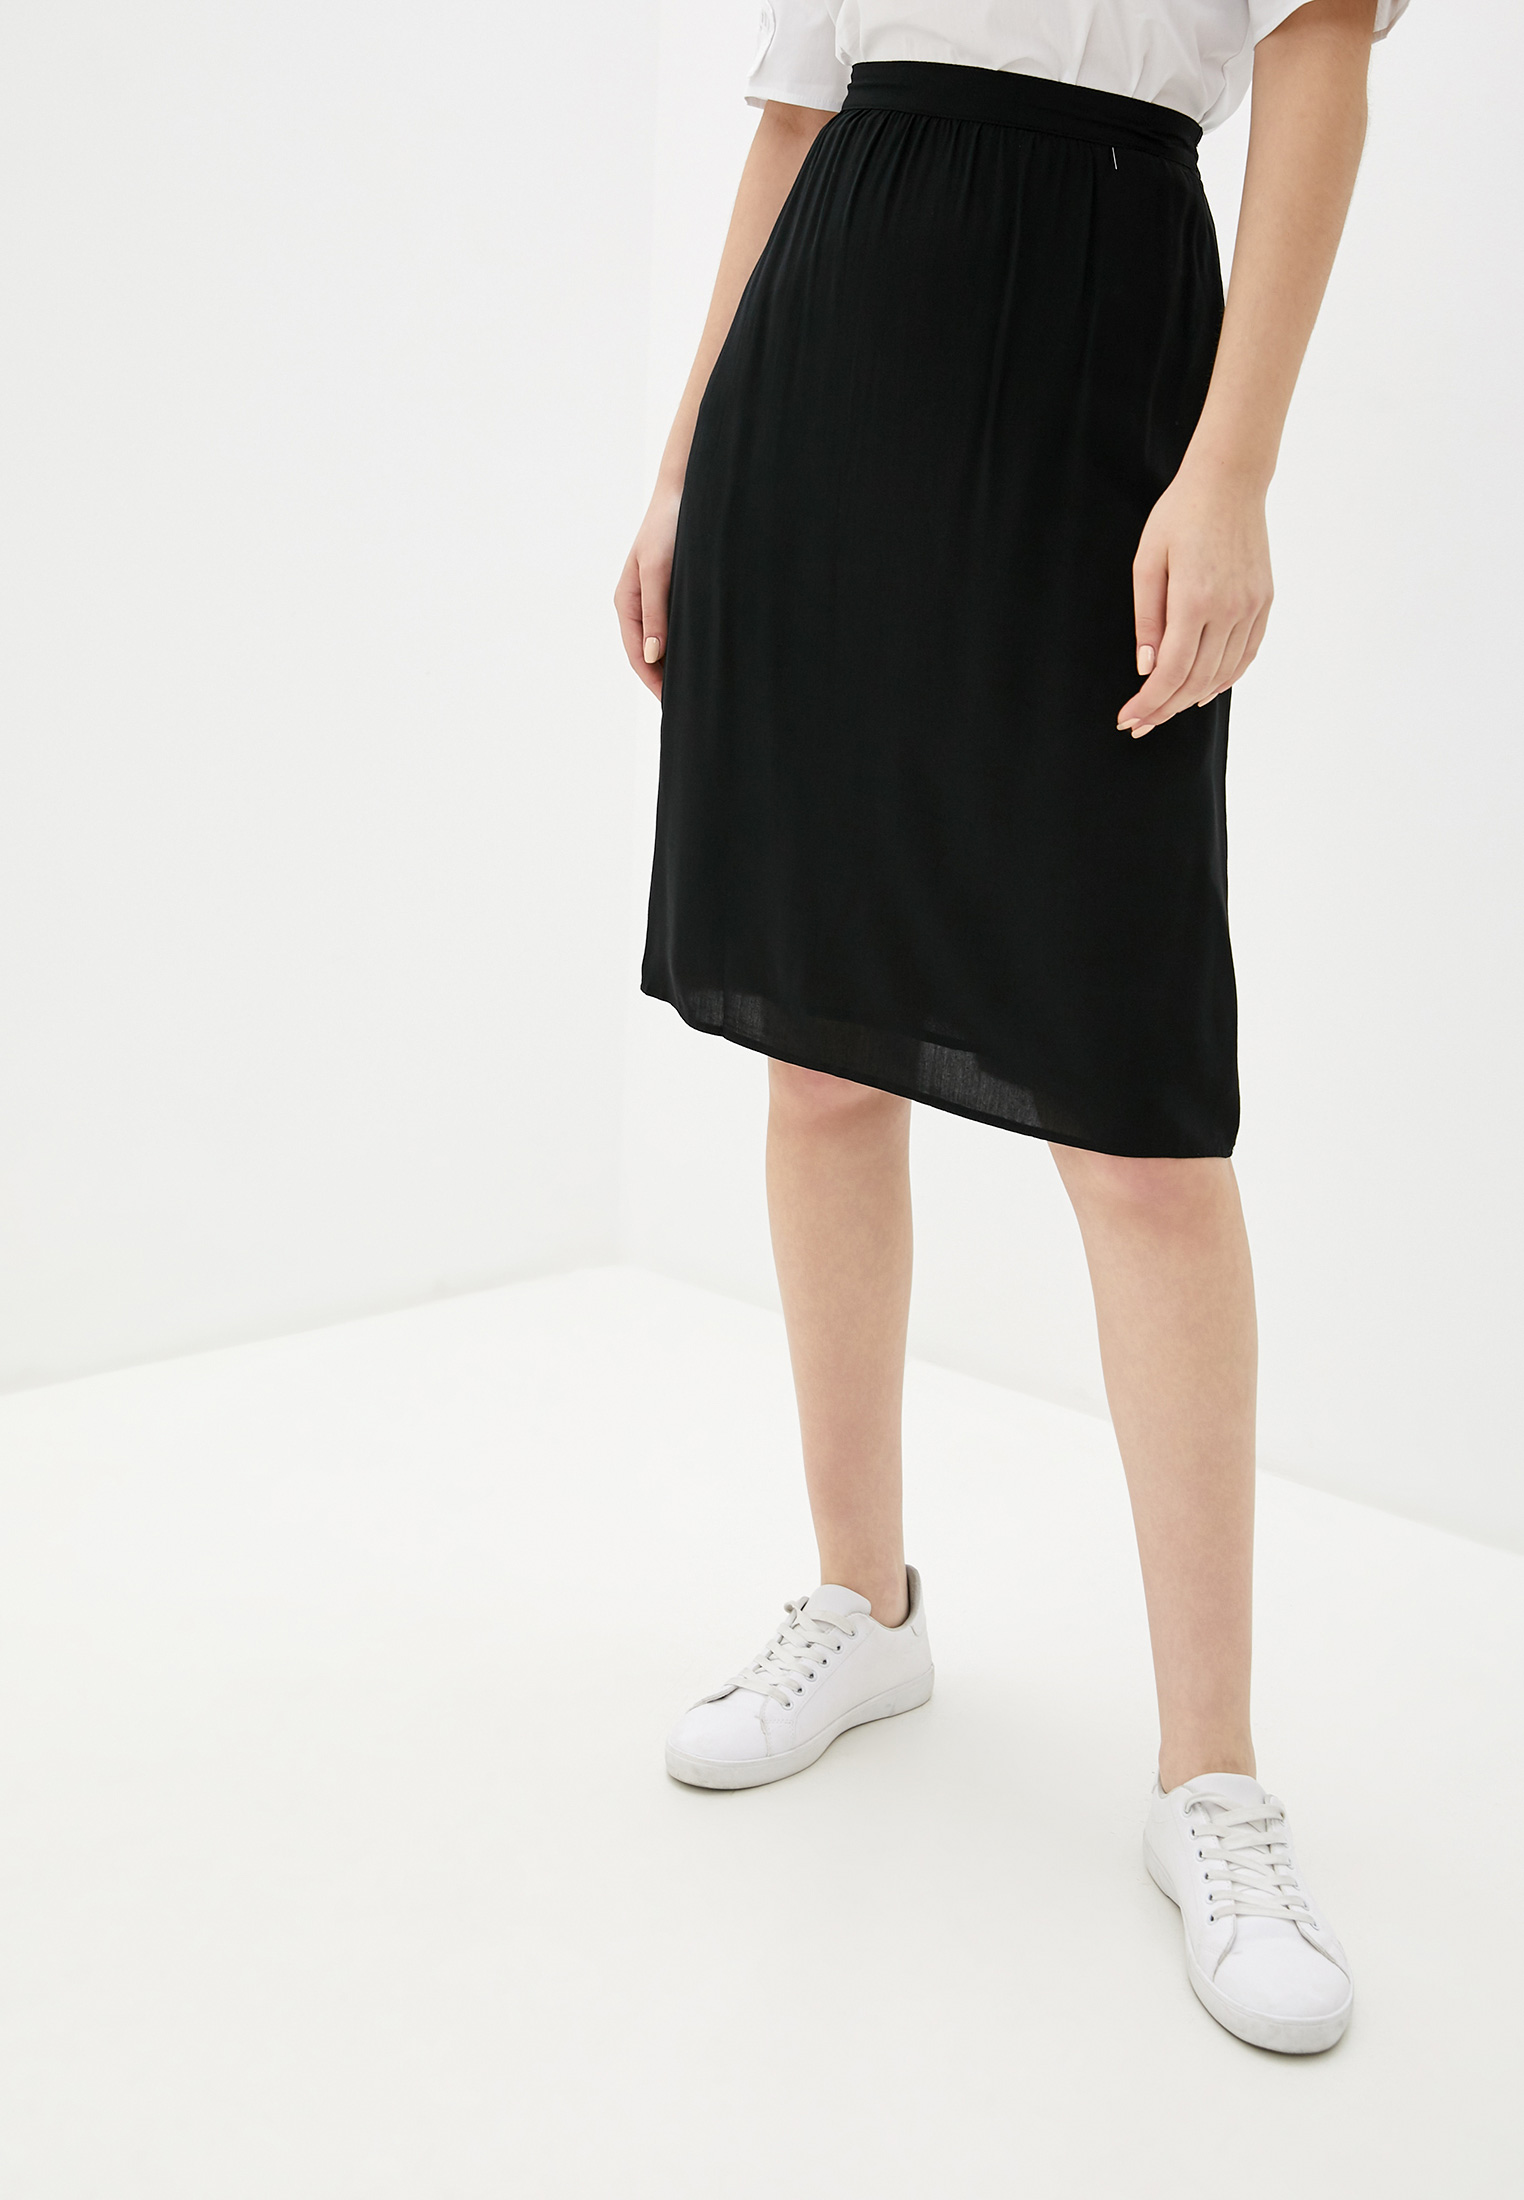 Широкая юбка Gerry Weber (Гарри Вебер) 610135-67567